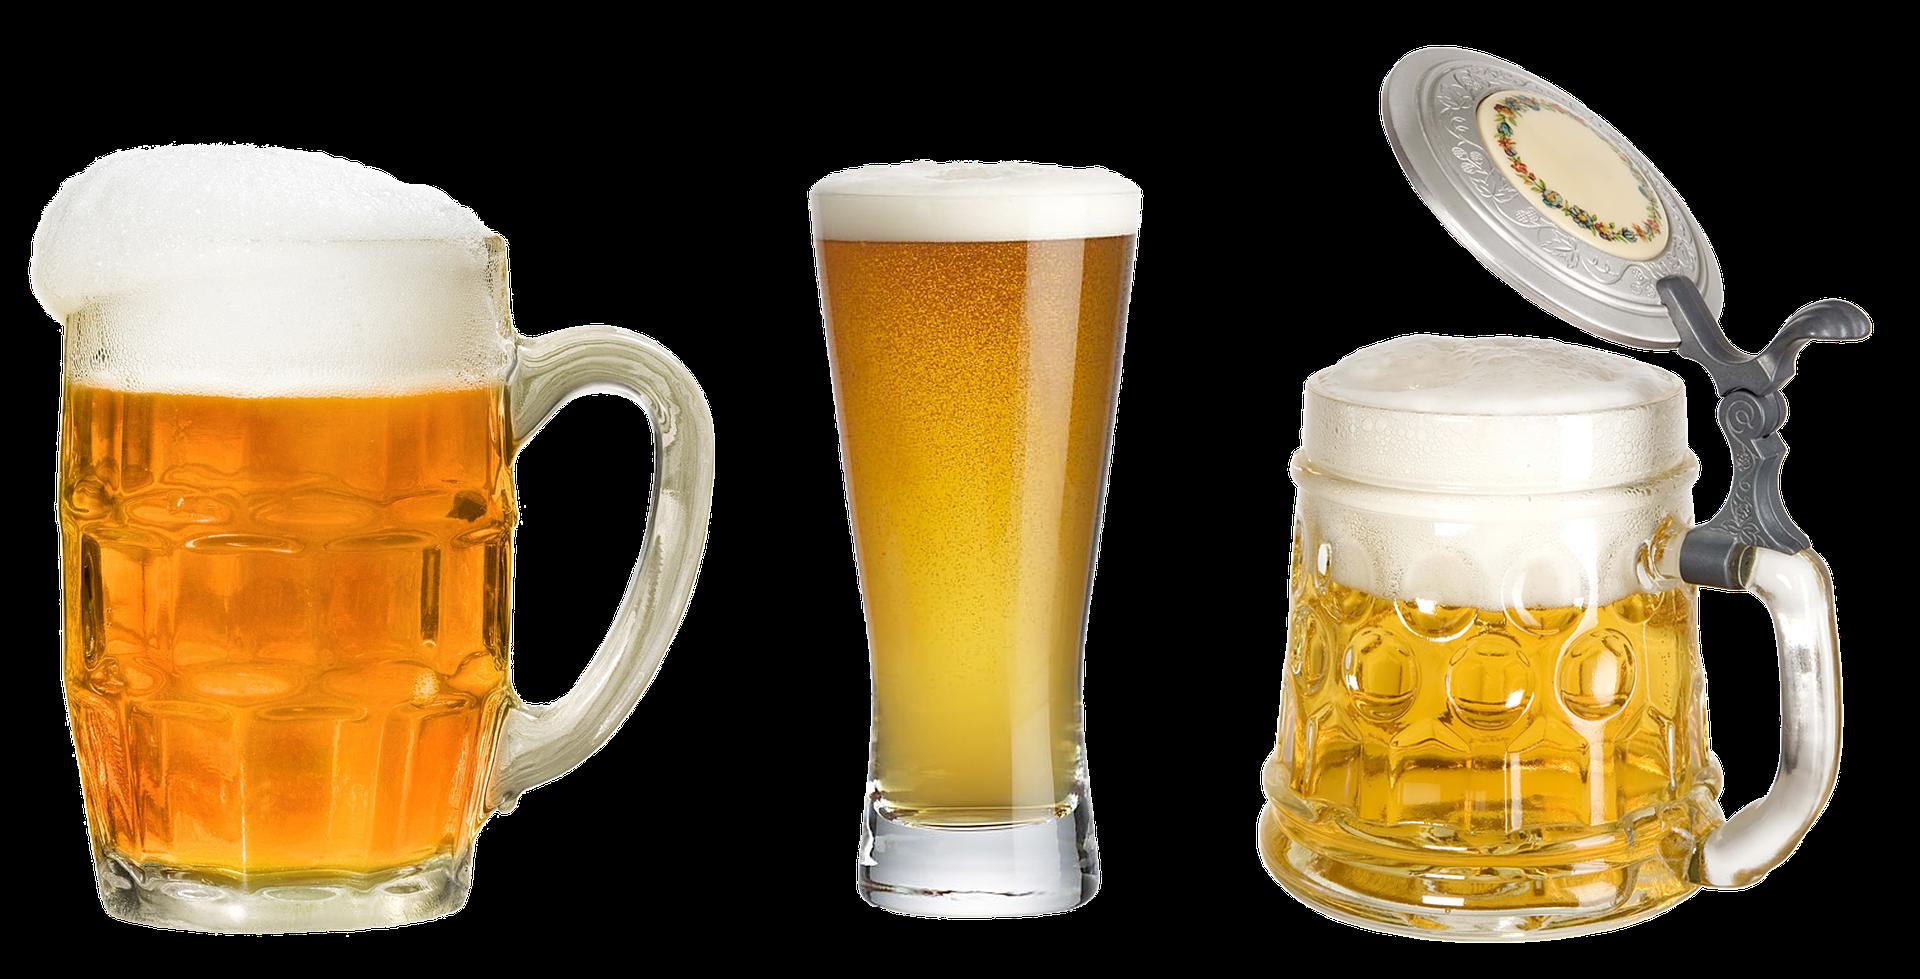 APV: Konkurs za bespovratna sredstva za proizvodnju piva u 2021 godini